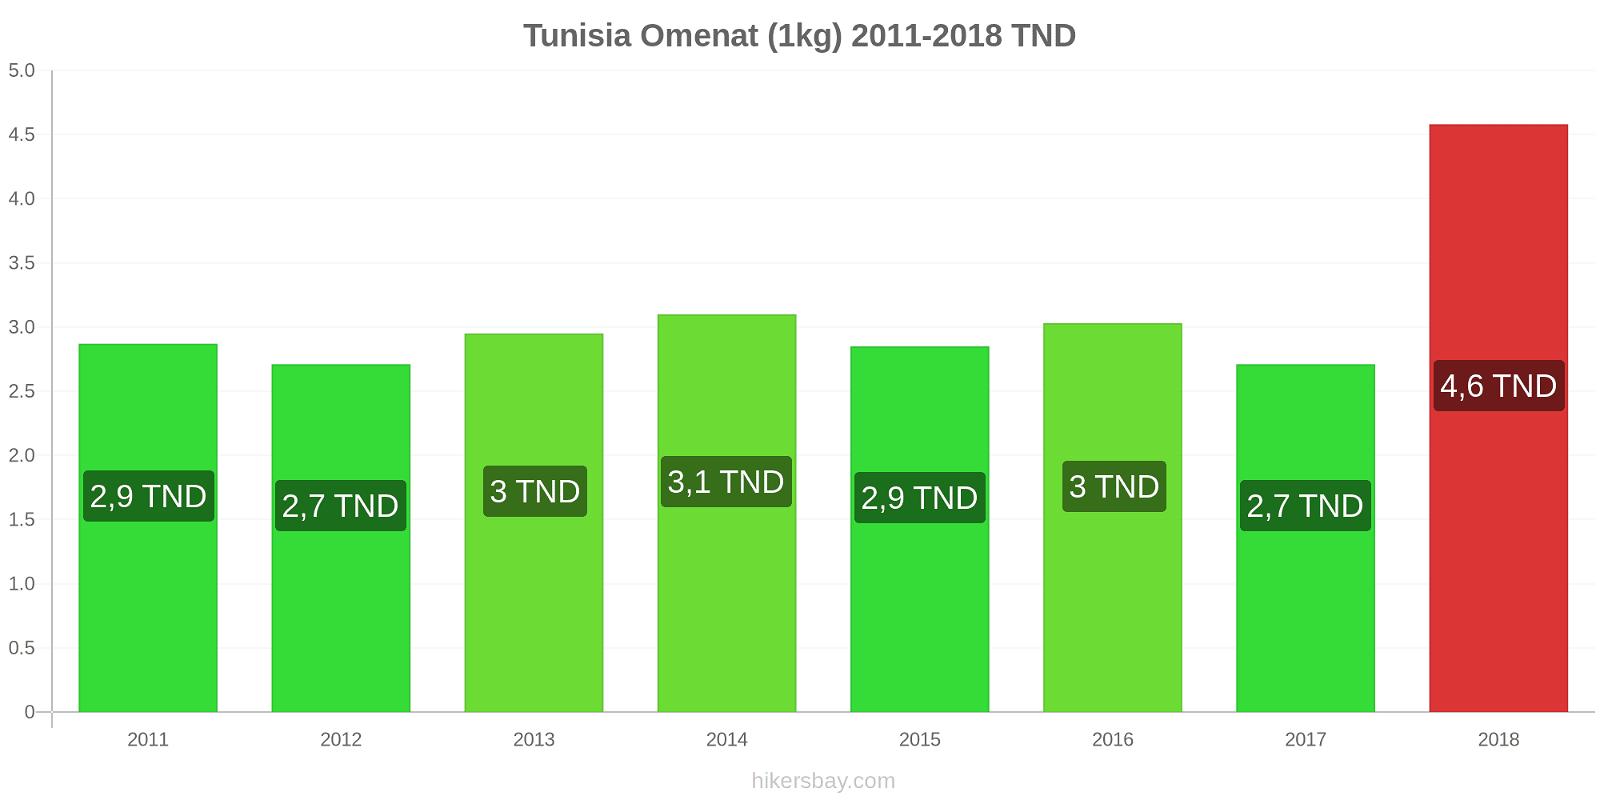 Tunisia hintojen muutokset Omenat (1kg) hikersbay.com